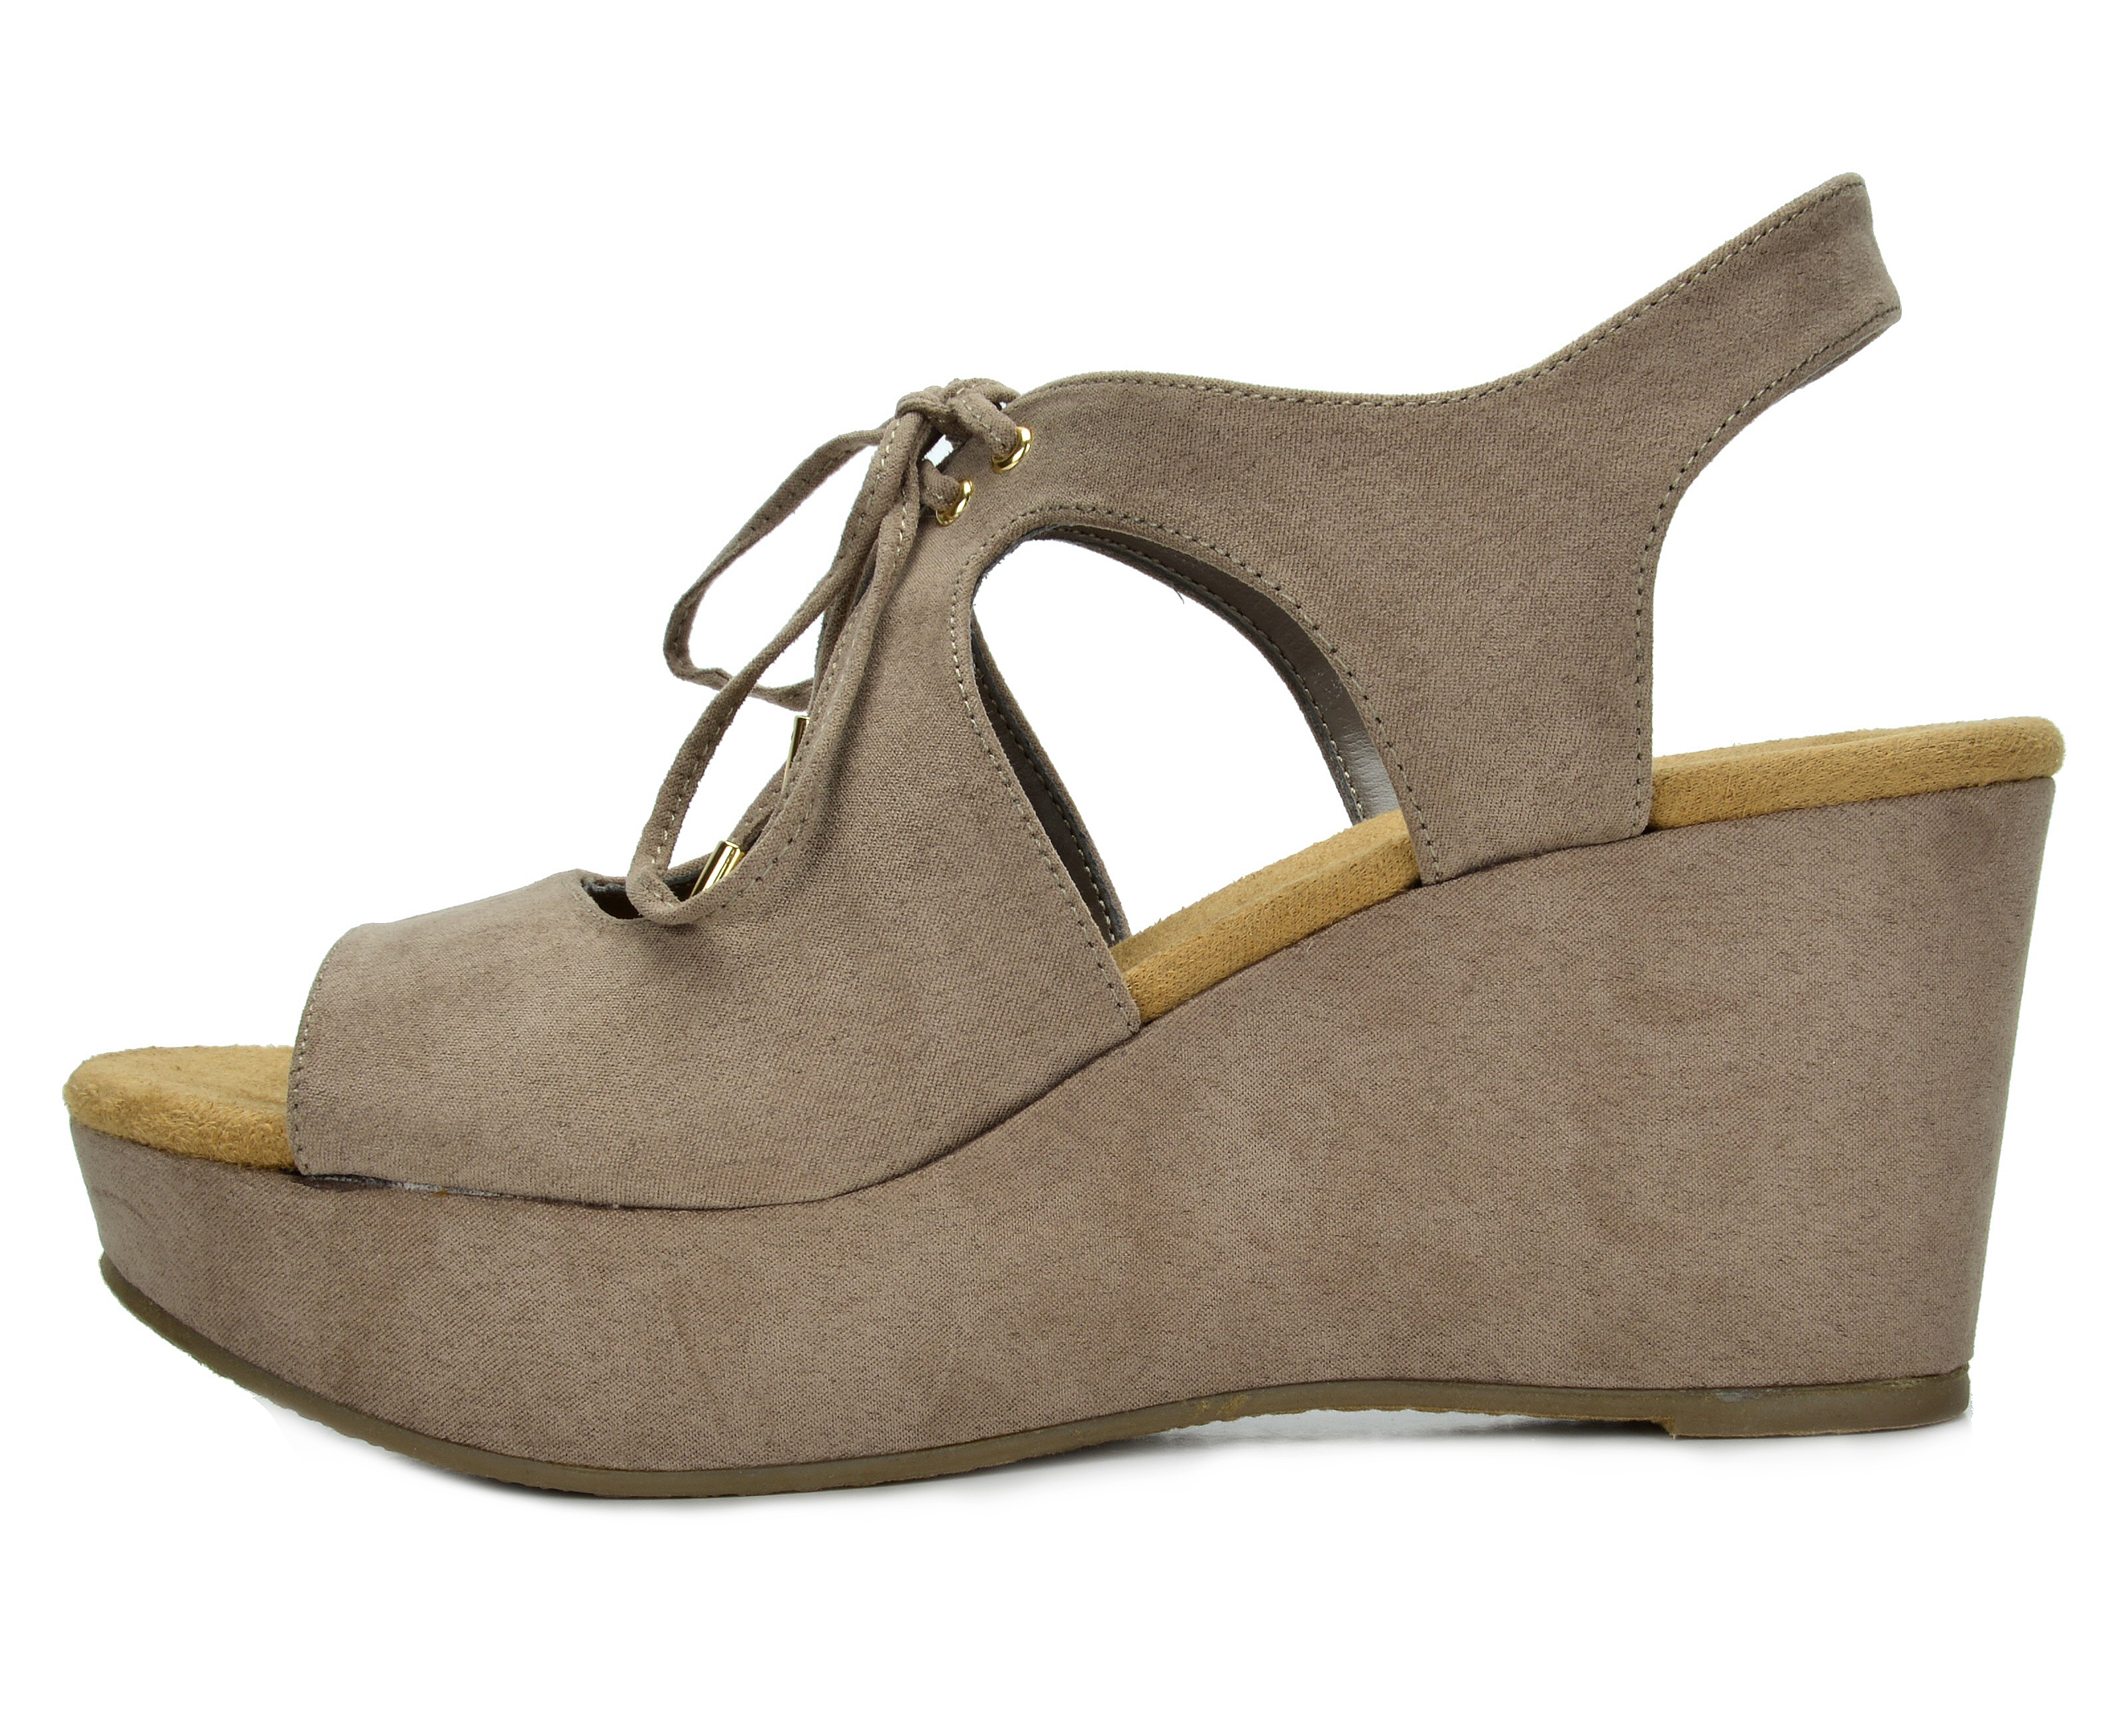 47b42583b25d TOETOS SANDRO-02 Womens Open Toe Mid Heel Lace Up Platform Wedges ...